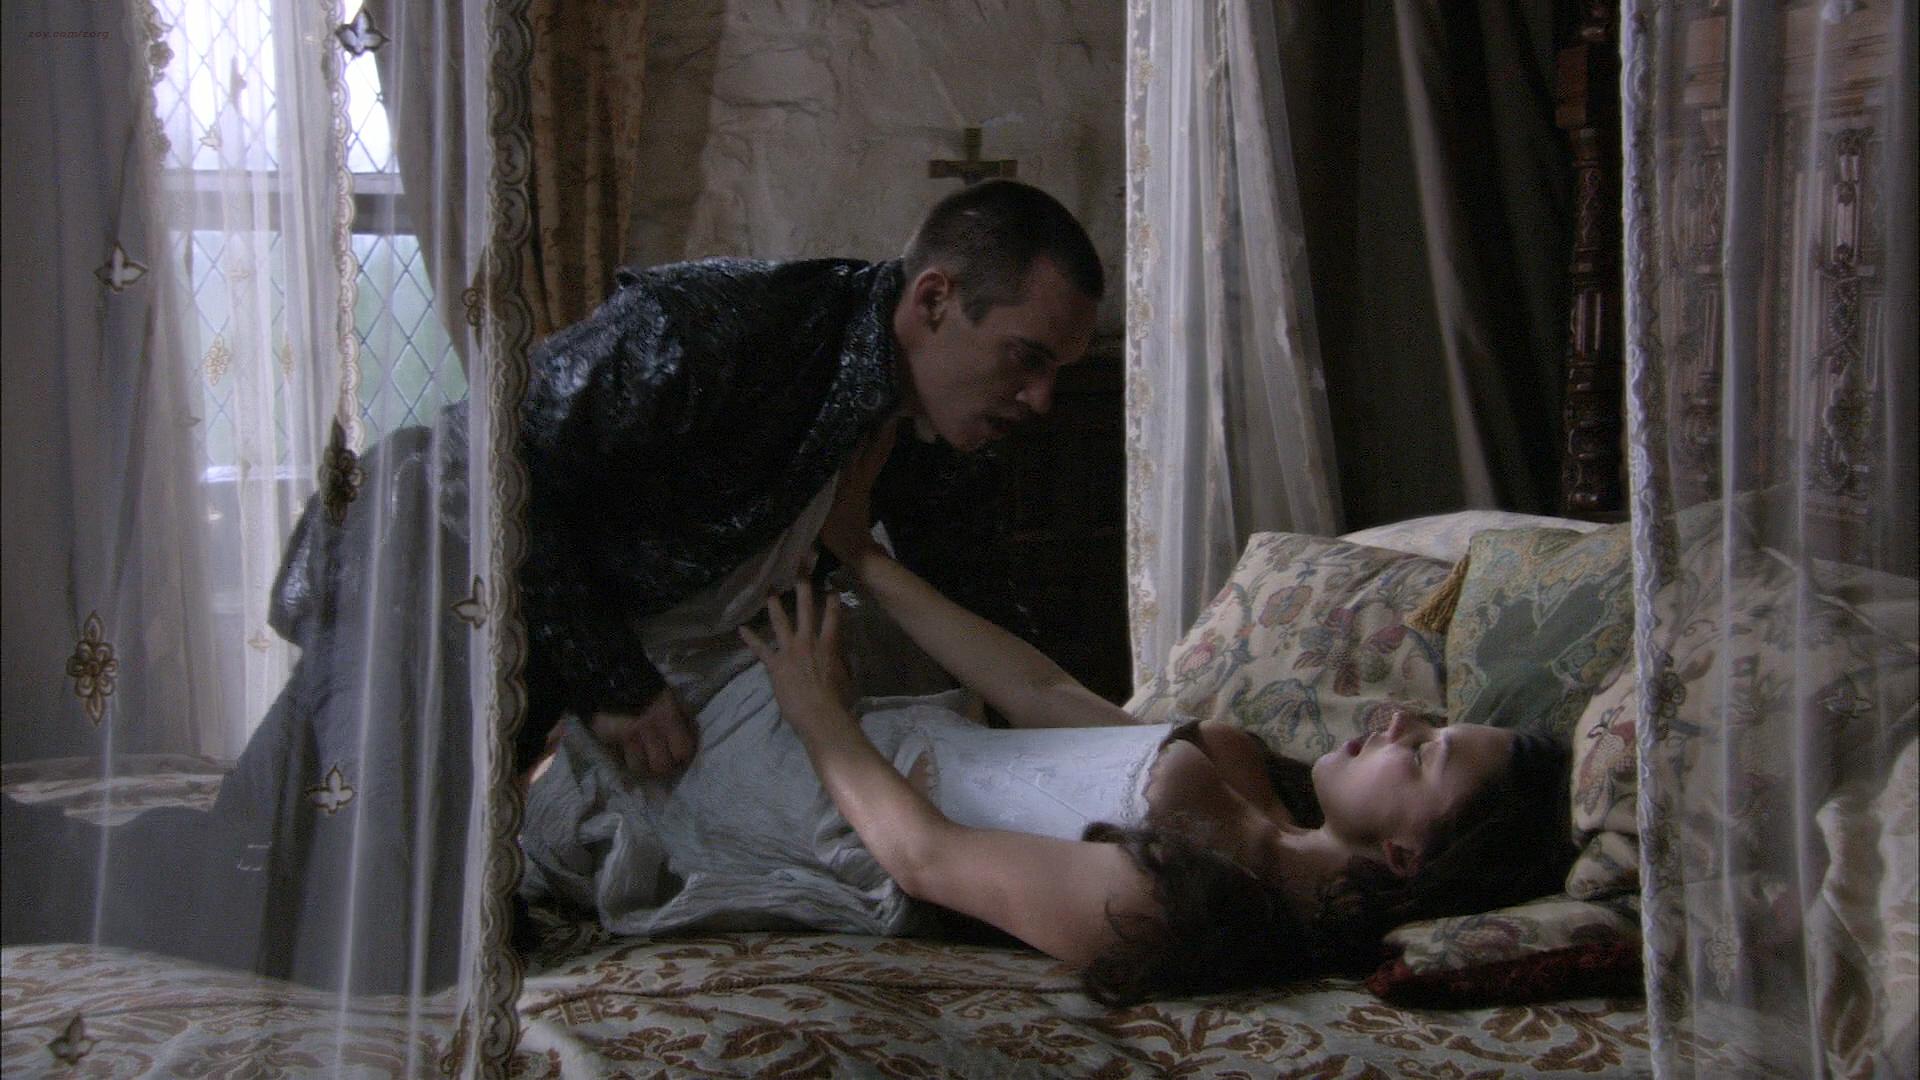 Natalie Dormer hot sex and Gabrielle Anwar hot - The Tudors (2007) S01E05 HD 1080p (7)